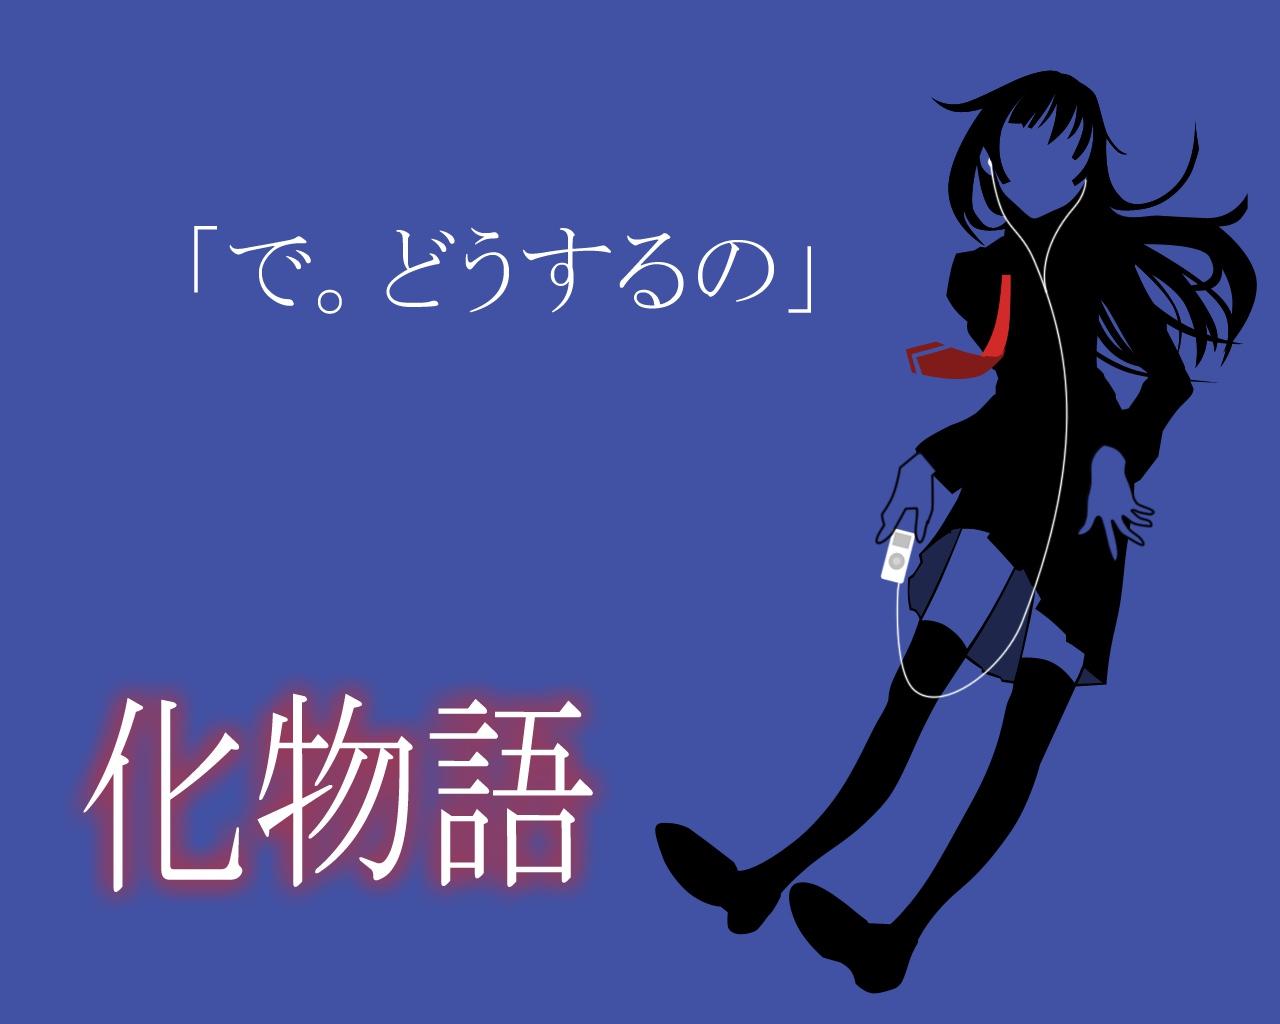 bakemonogatari blue monogatari_(series) polychromatic senjougahara_hitagi silhouette